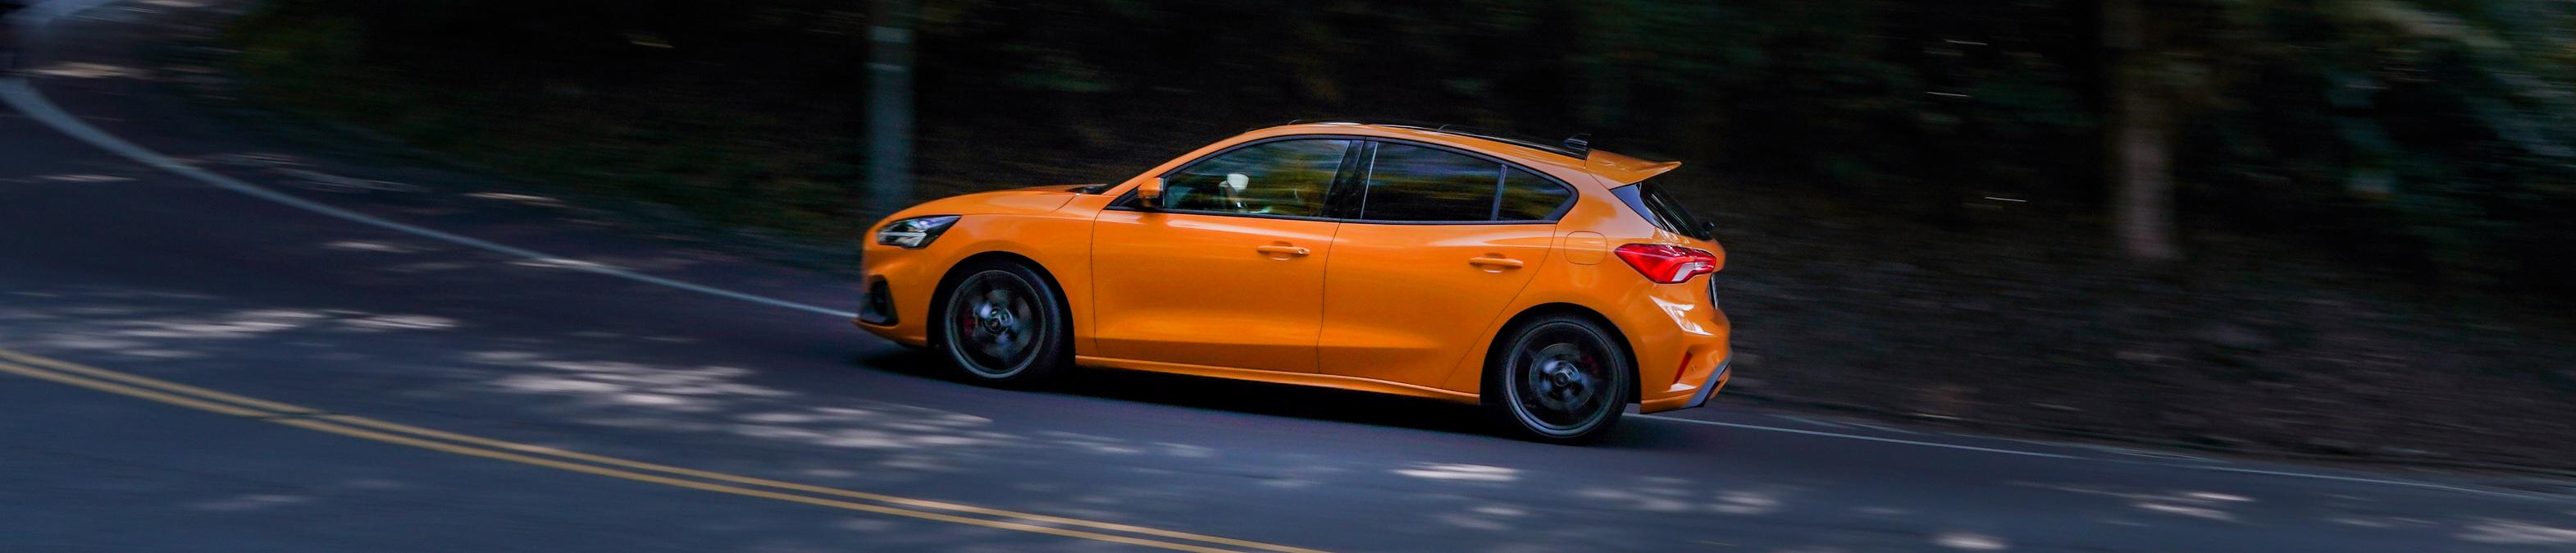 Ford Focus ST 售價 136.8 萬元。